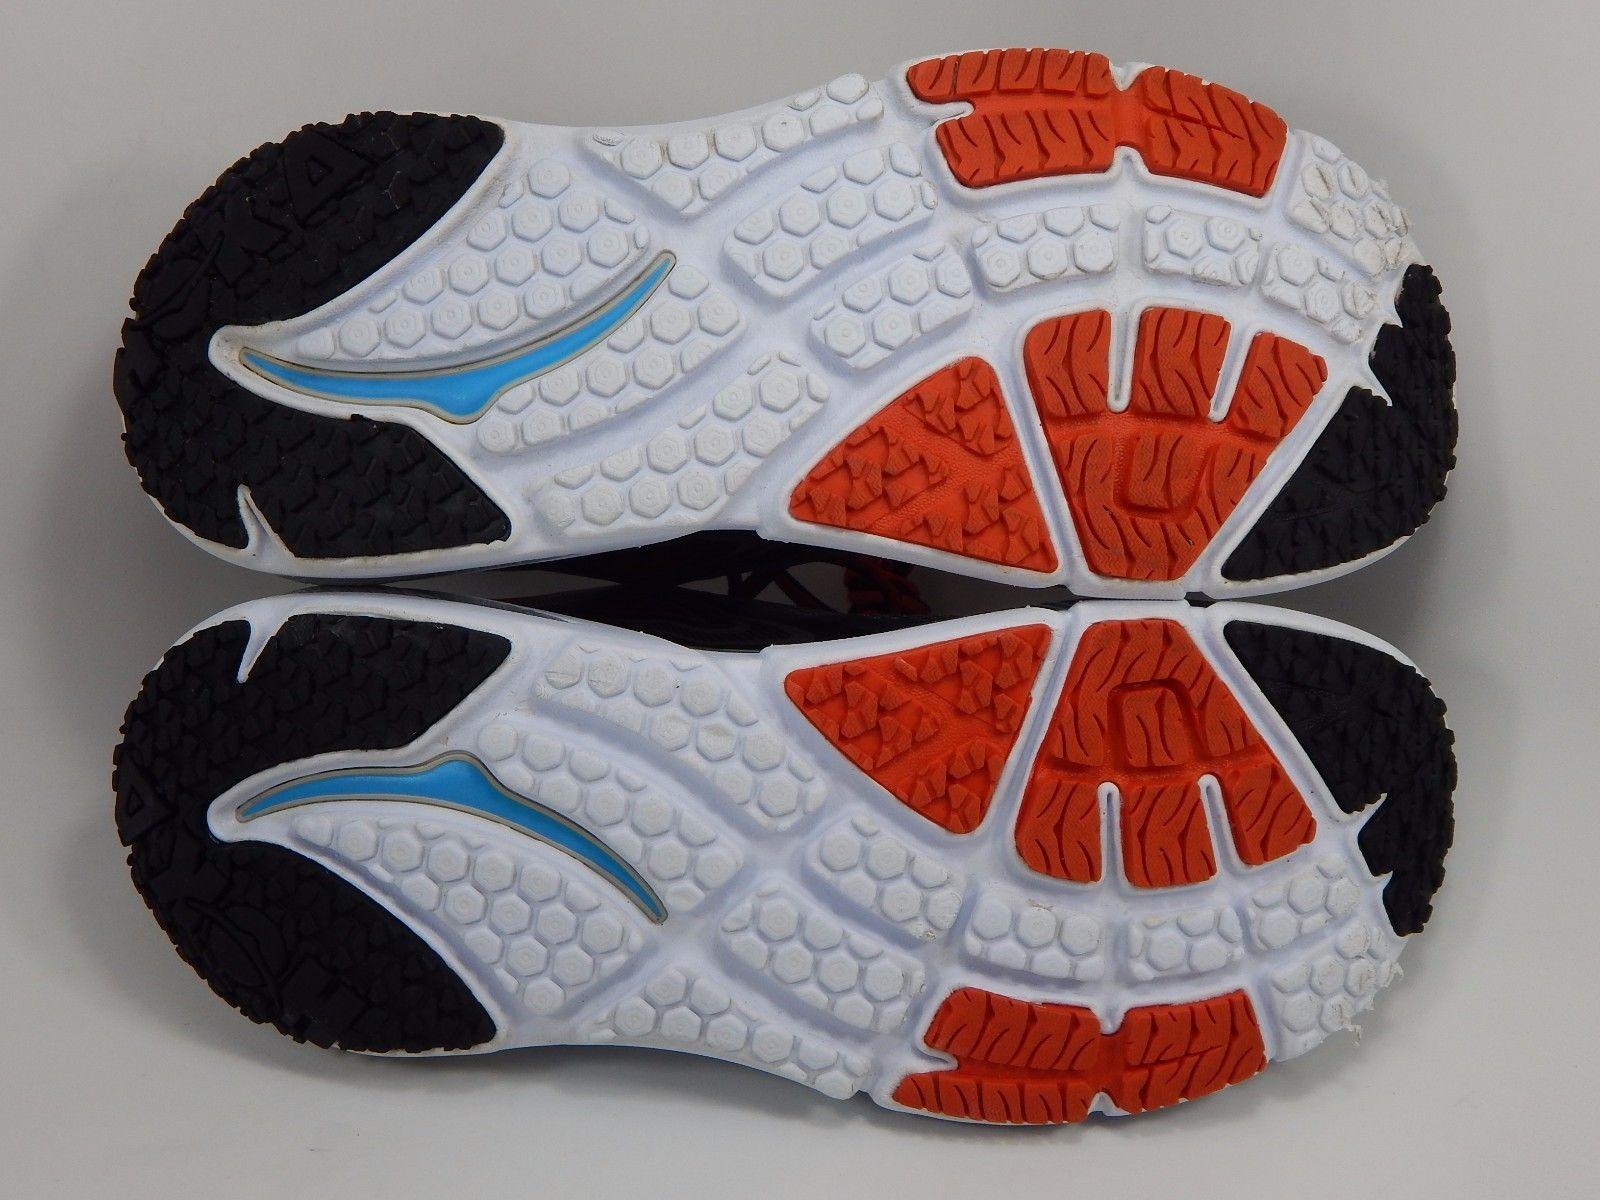 Hoka One One Bondi 4 Men's Running Shoes Size US 9 M (D) EU 42 2/3 Gray Red